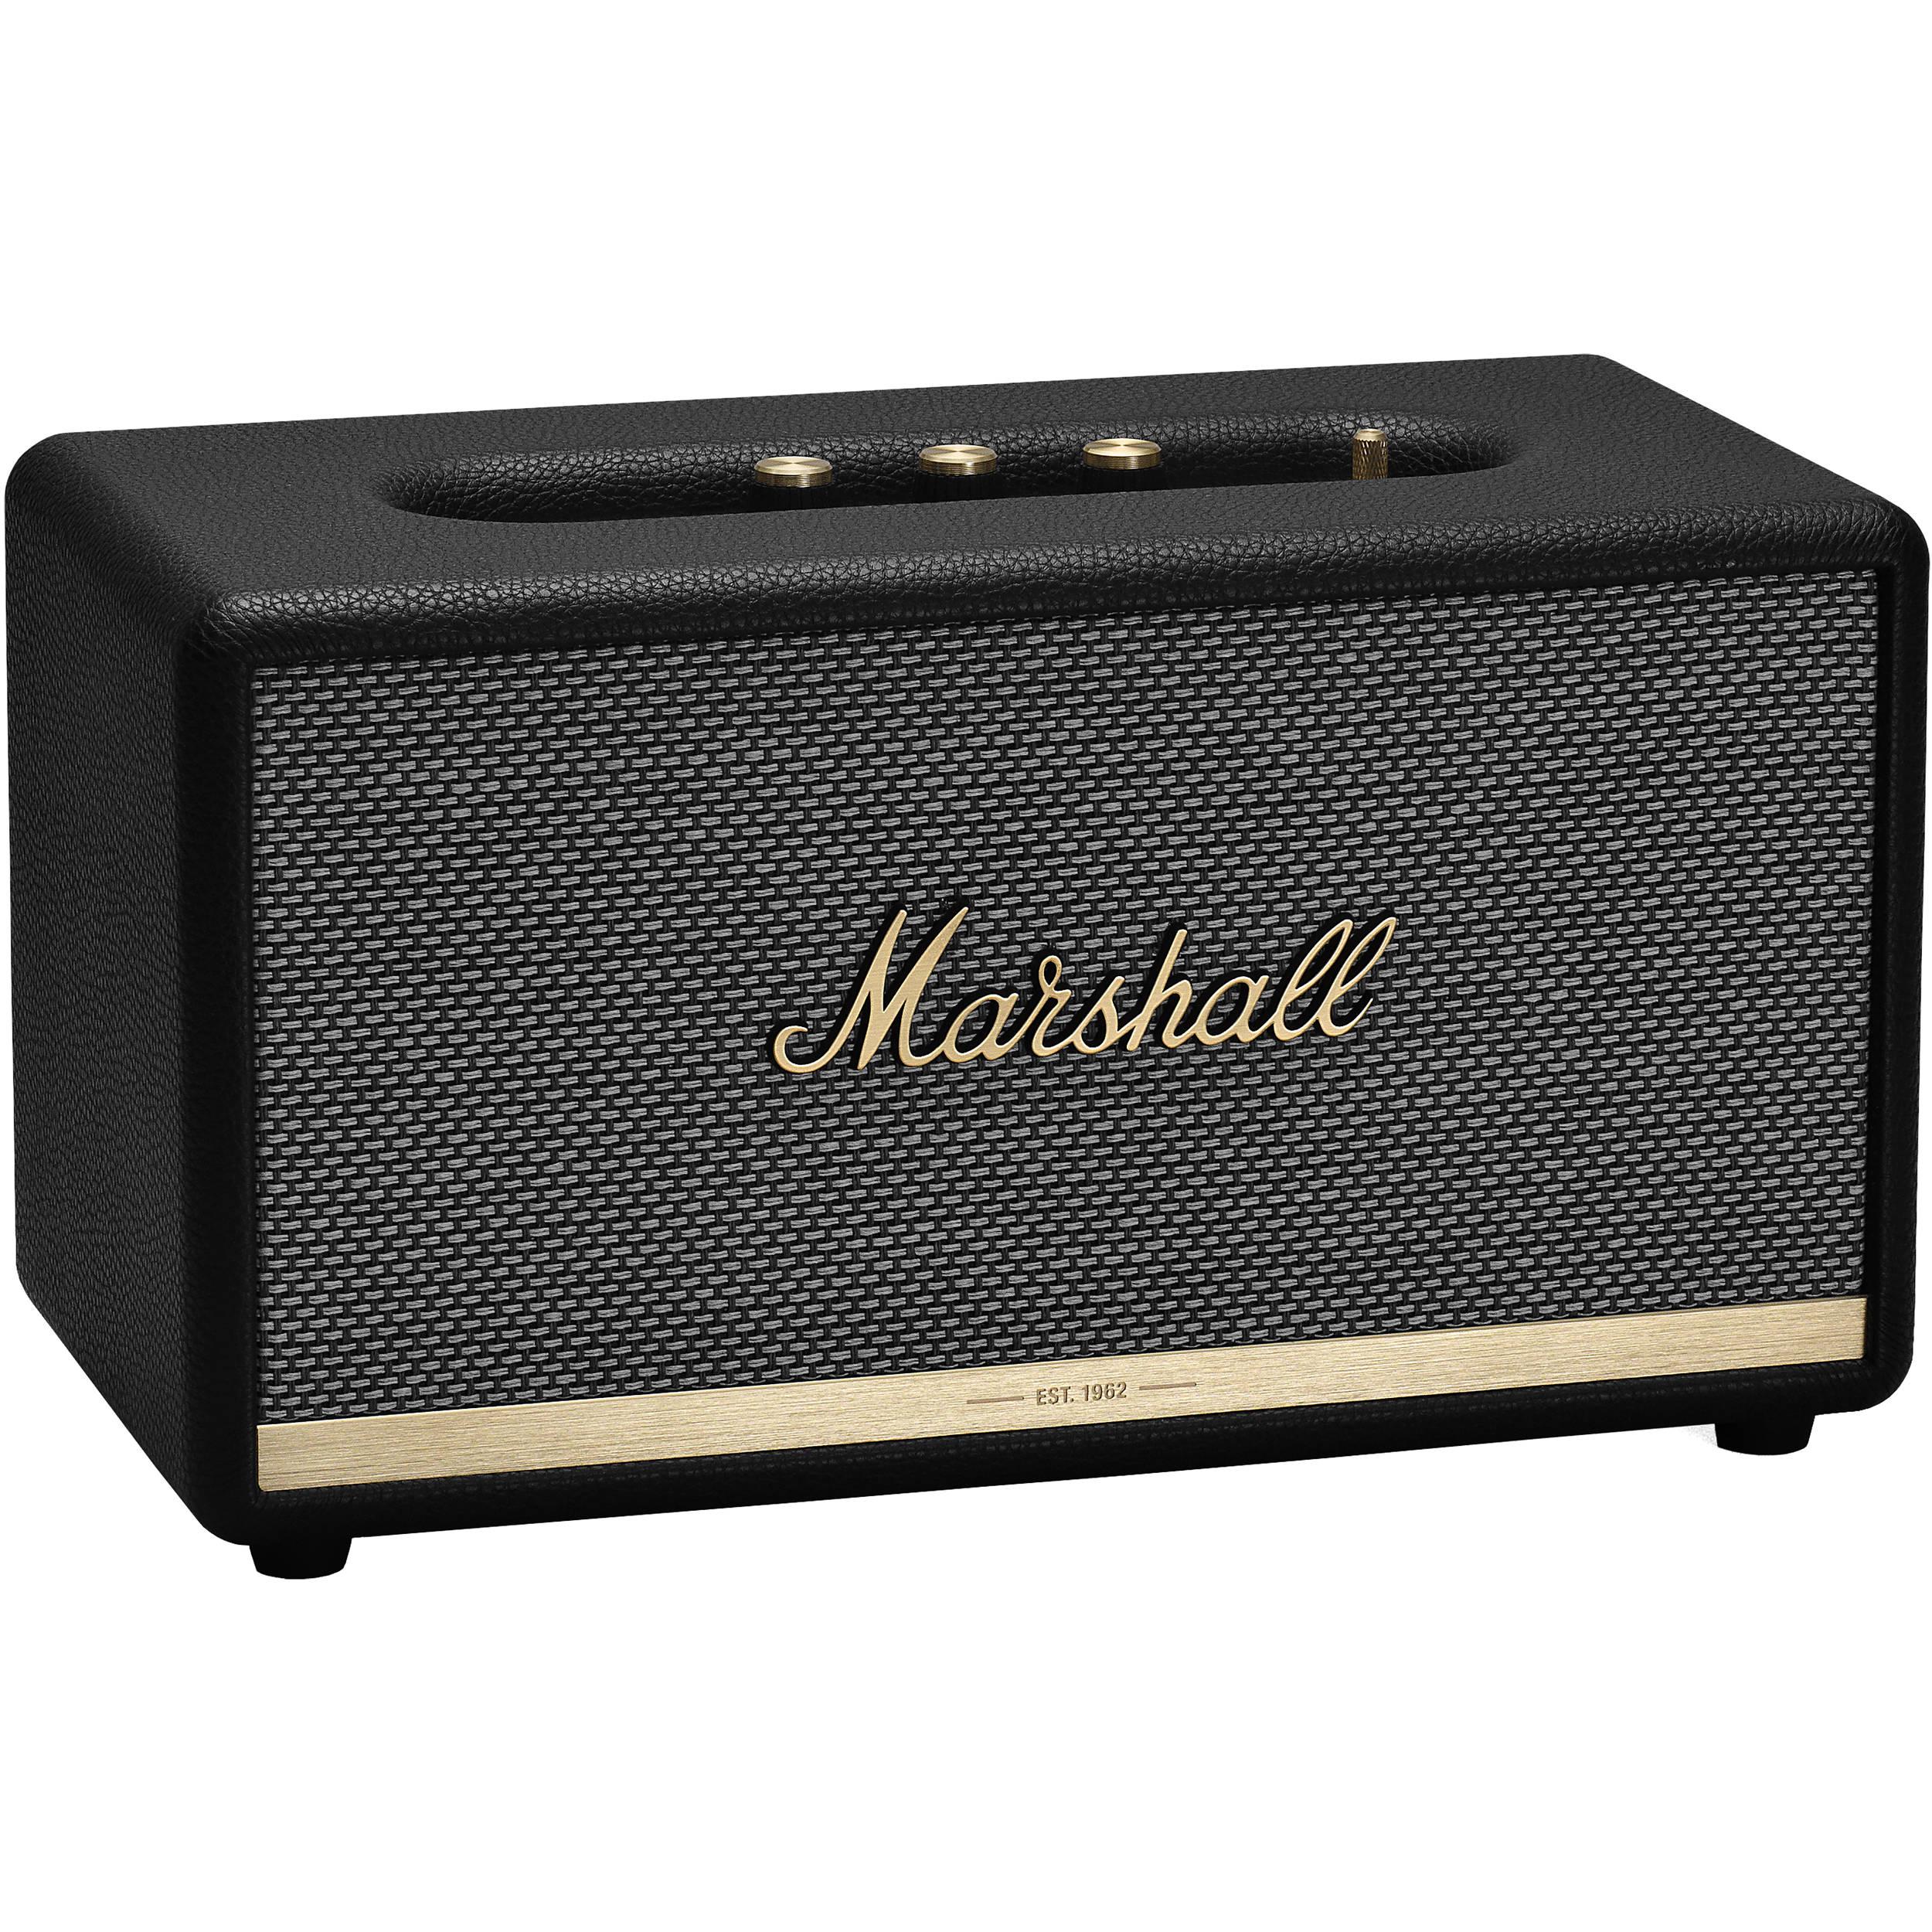 Marshall Stanmore II Bluetooth Speaker System (Black)